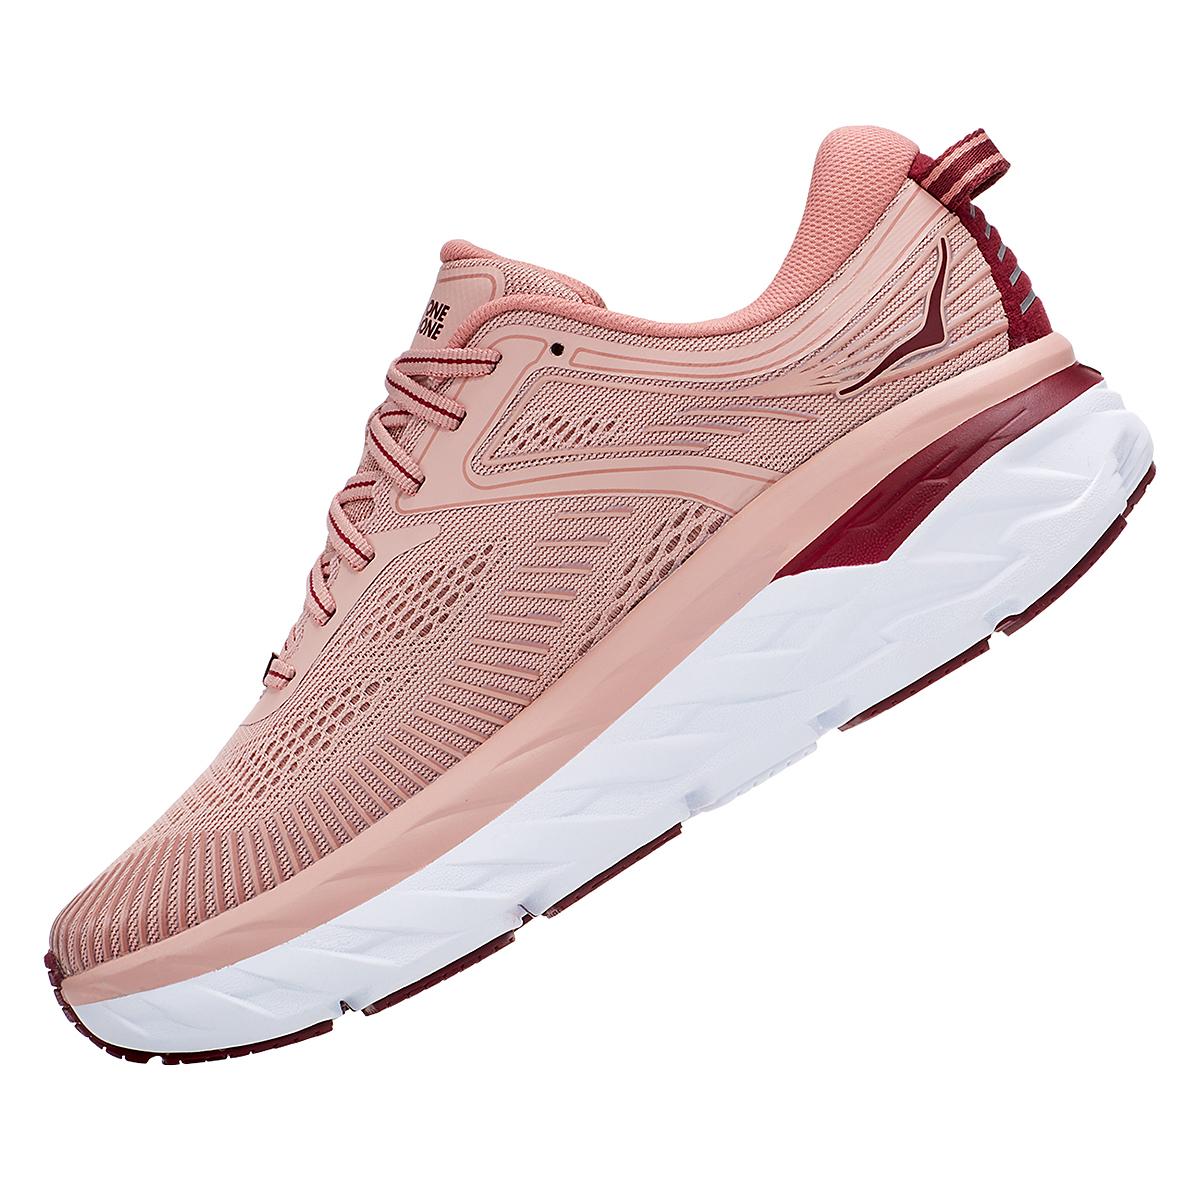 Women's Hoka One One Bondi 7 Running Shoe - Color: Misty Rose/Cordovan - Size: 5 - Width: Regular, Misty Rose/Cordovan, large, image 6